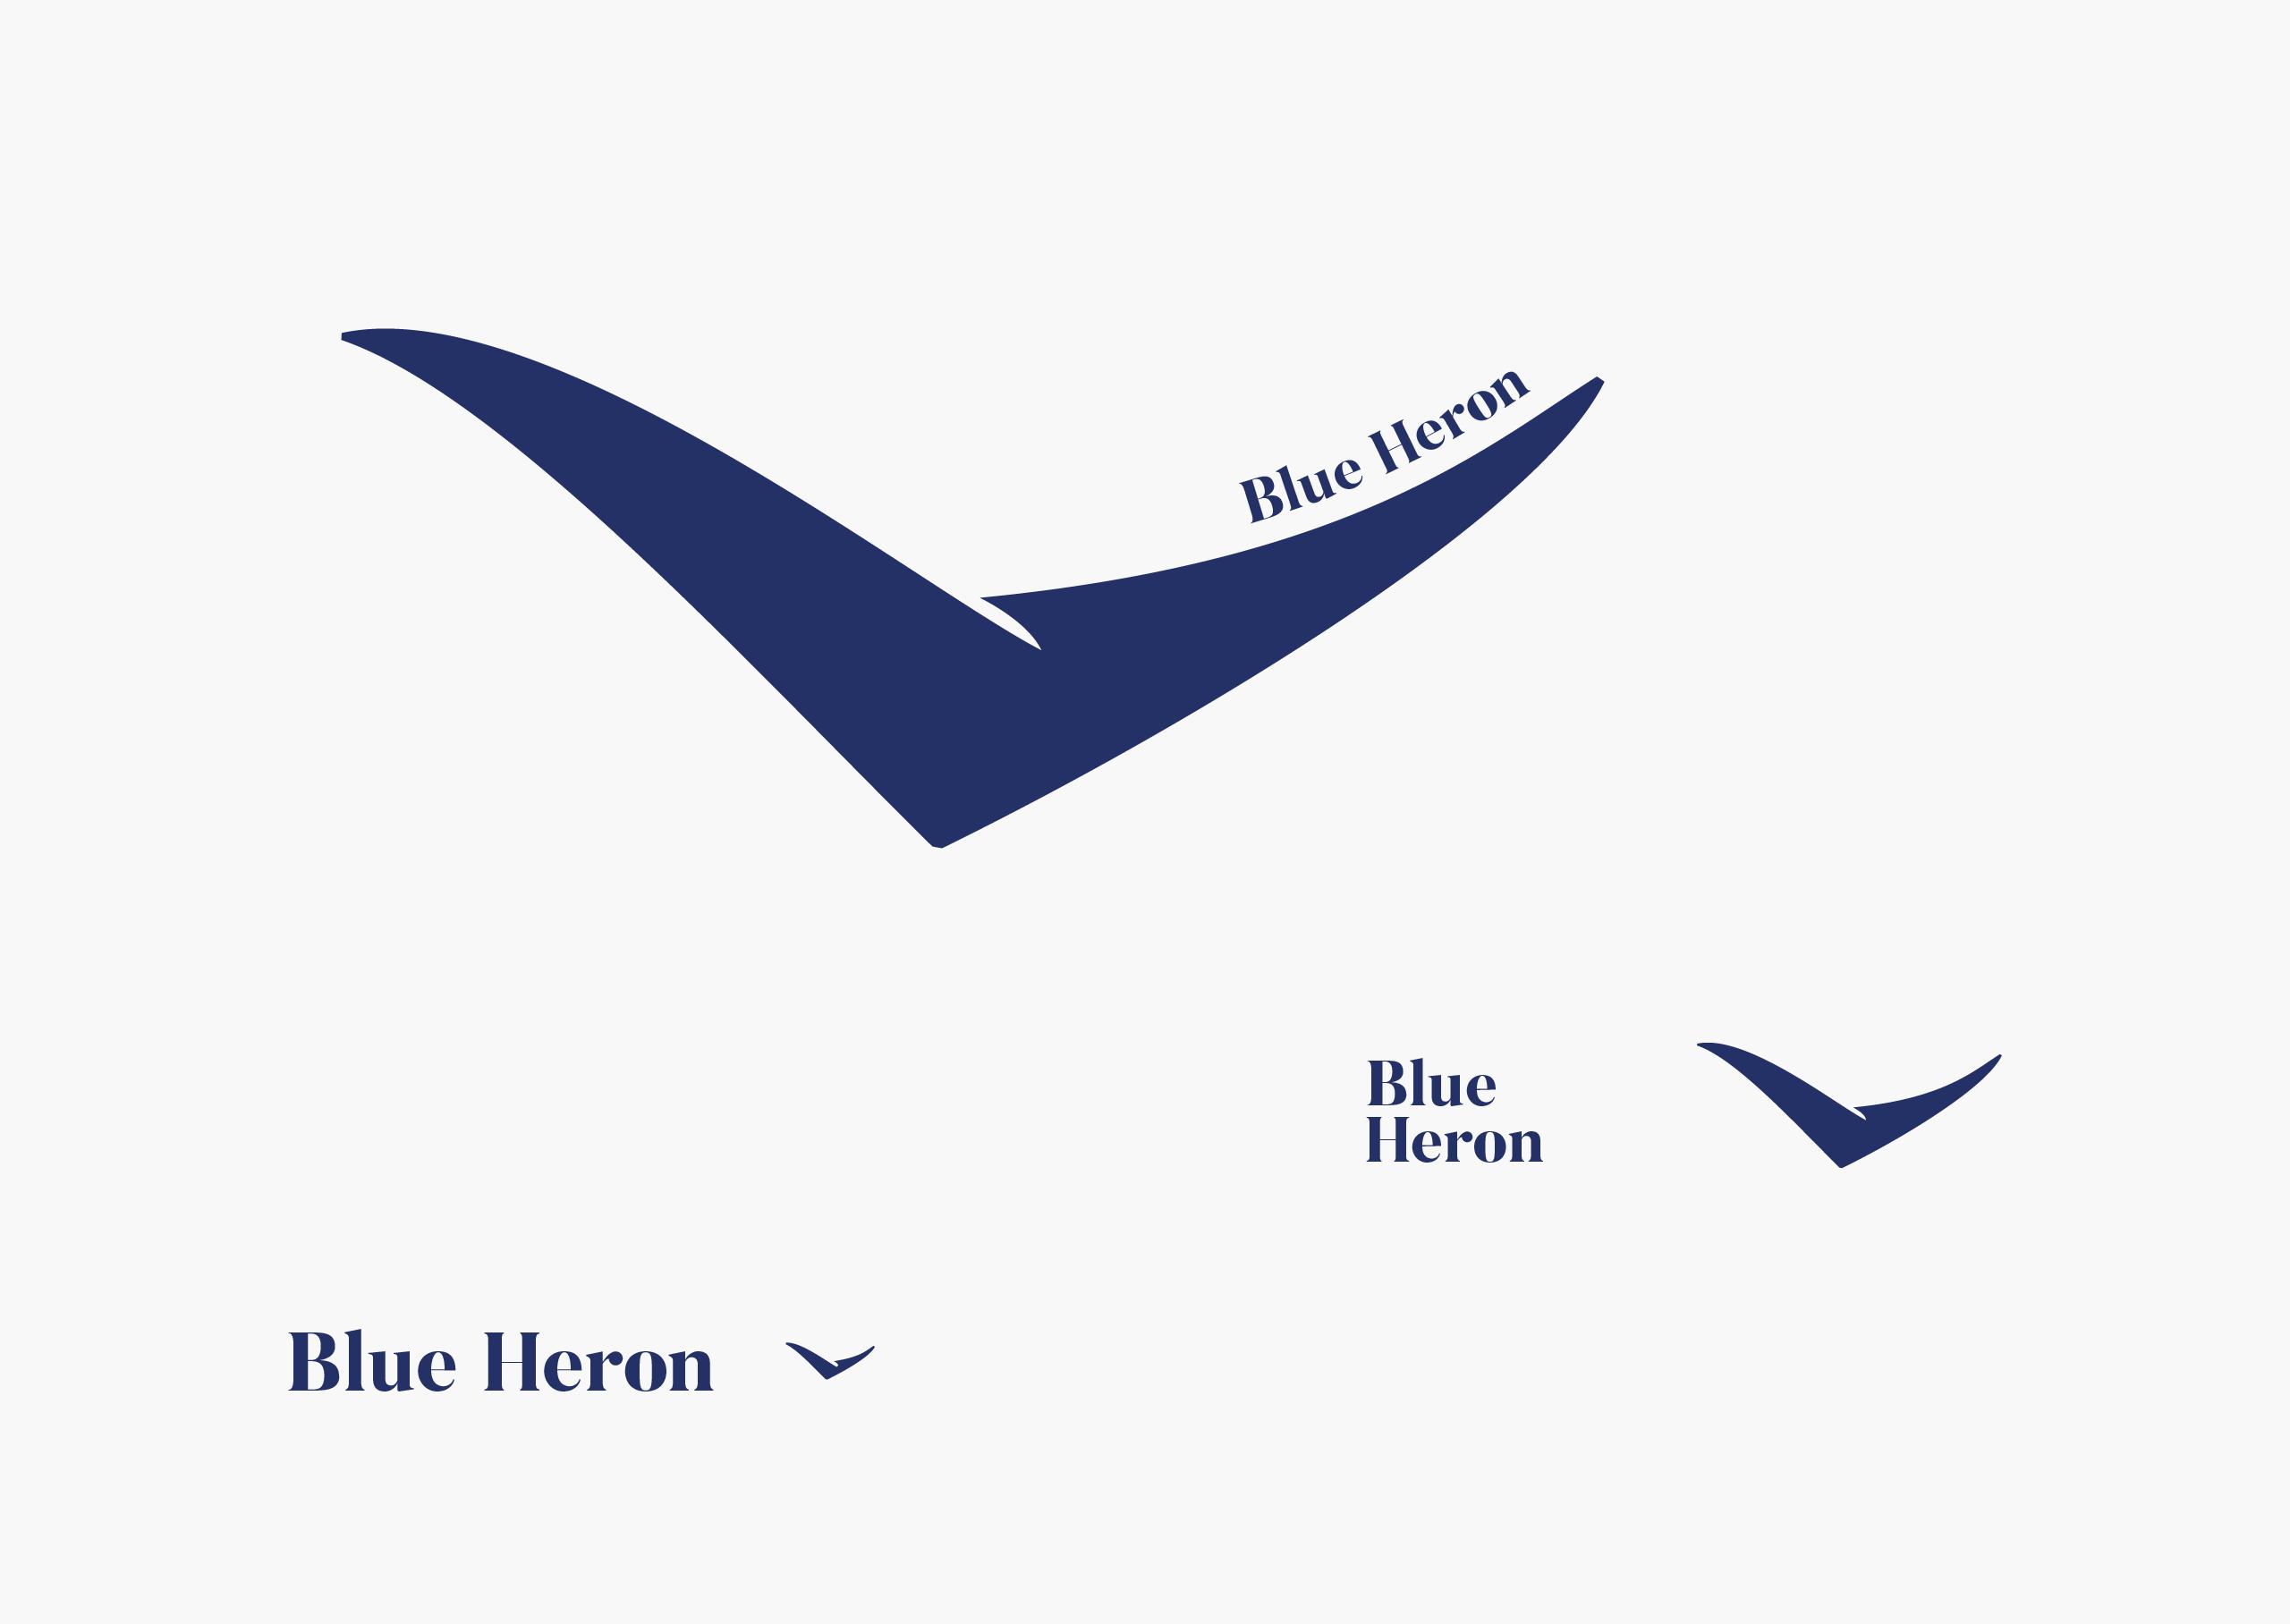 Blue Heron logos in three variations with varying emphasis on wordmark vs blue heron logo — by Dima Yagnyuk.